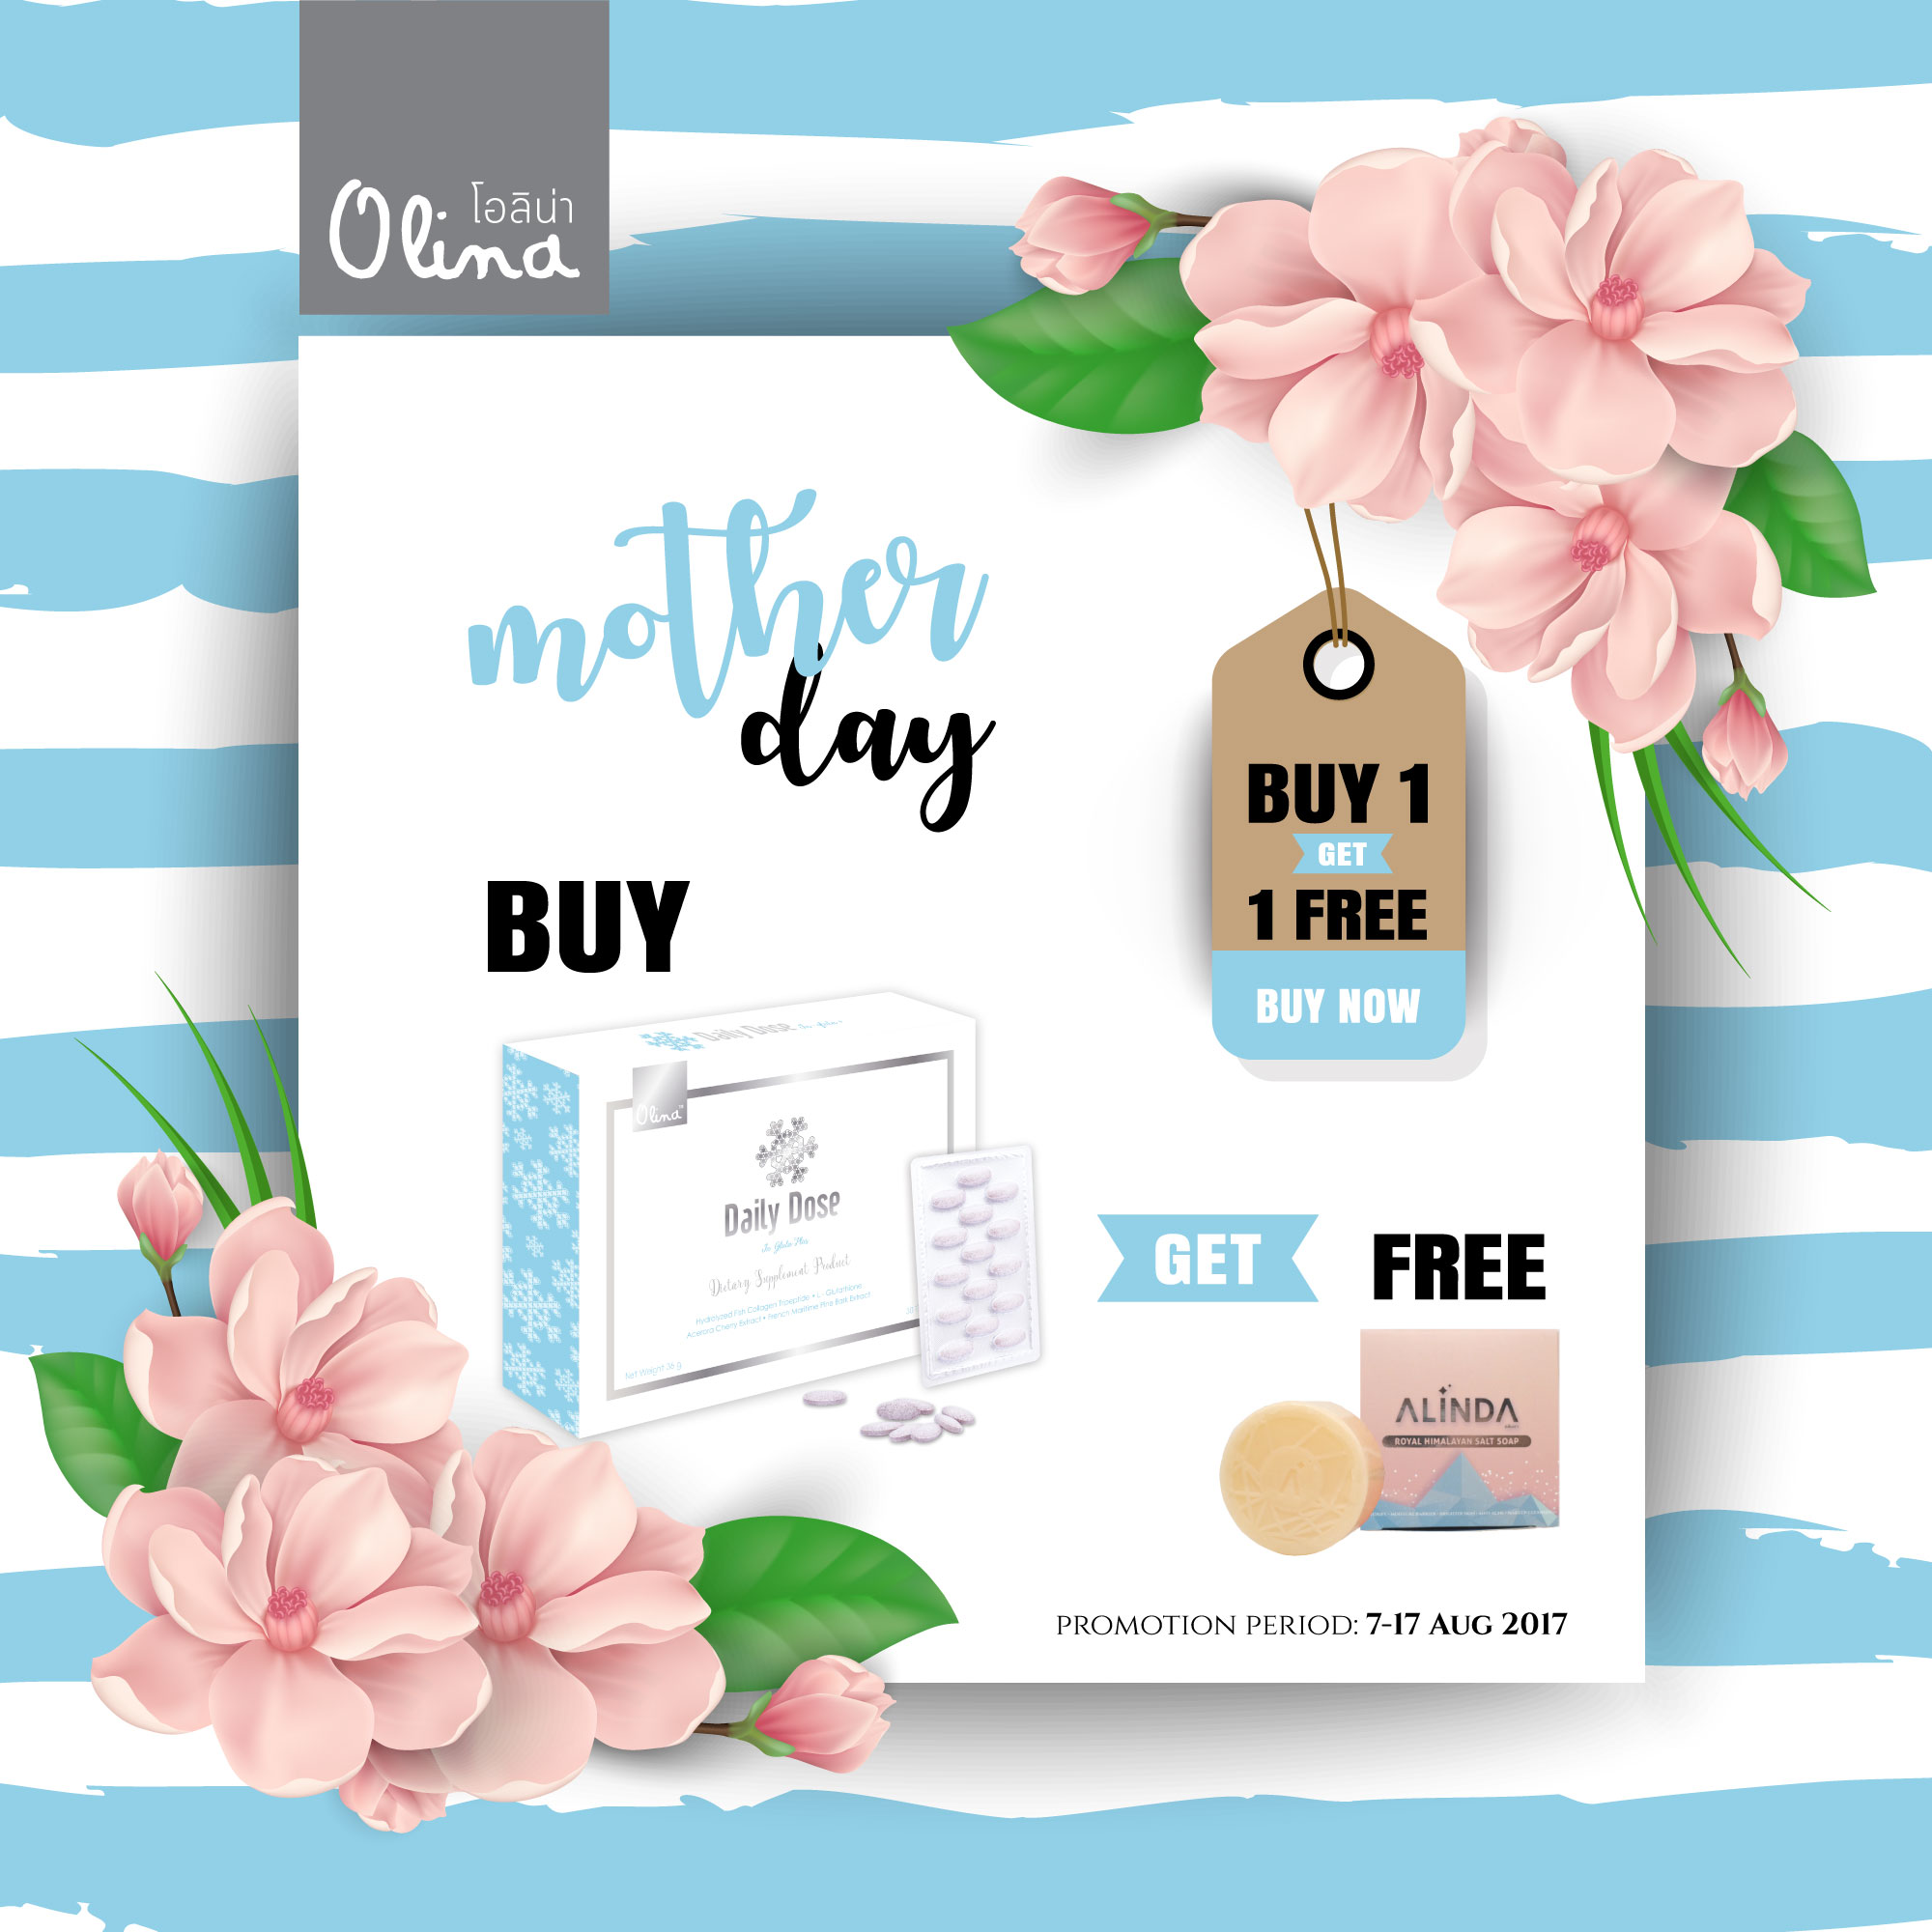 Promotion วันแม่! BUY 1 GET 1 FREE